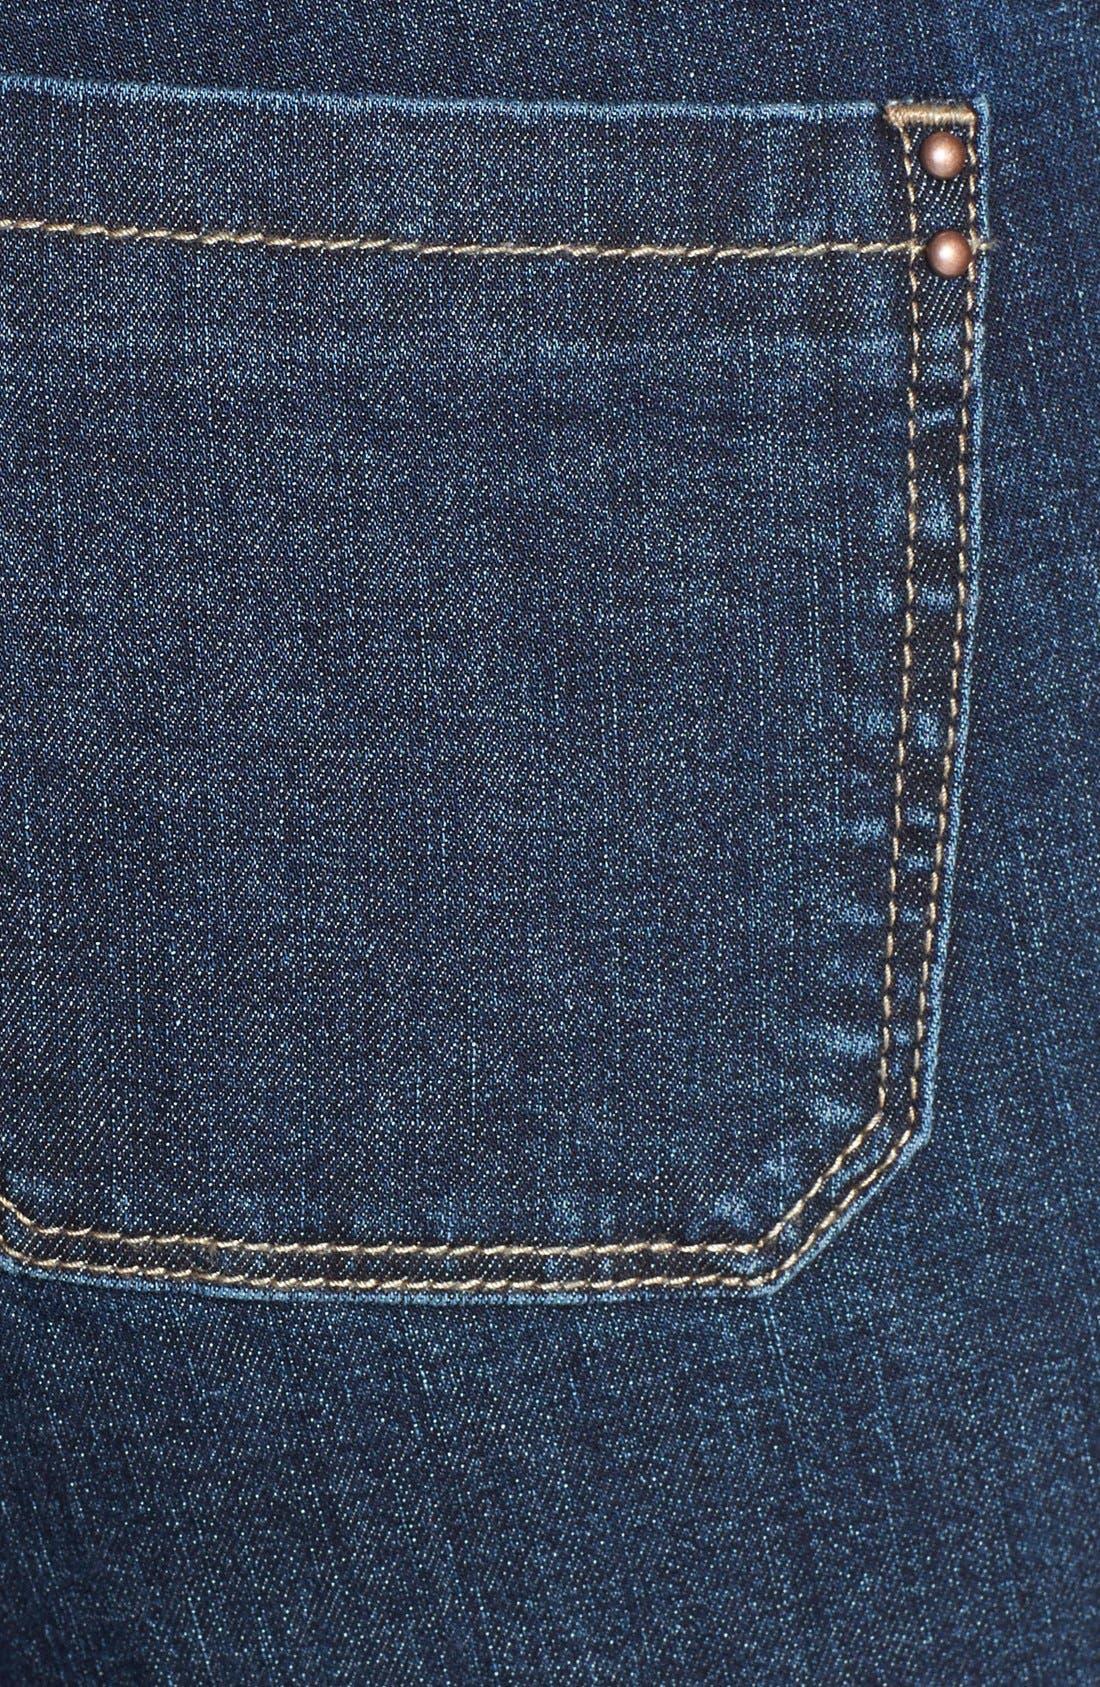 Alternate Image 3  - HART Denim 'Pheona' Wide Leg Trouser Jeans (Carbon) (Juniors)